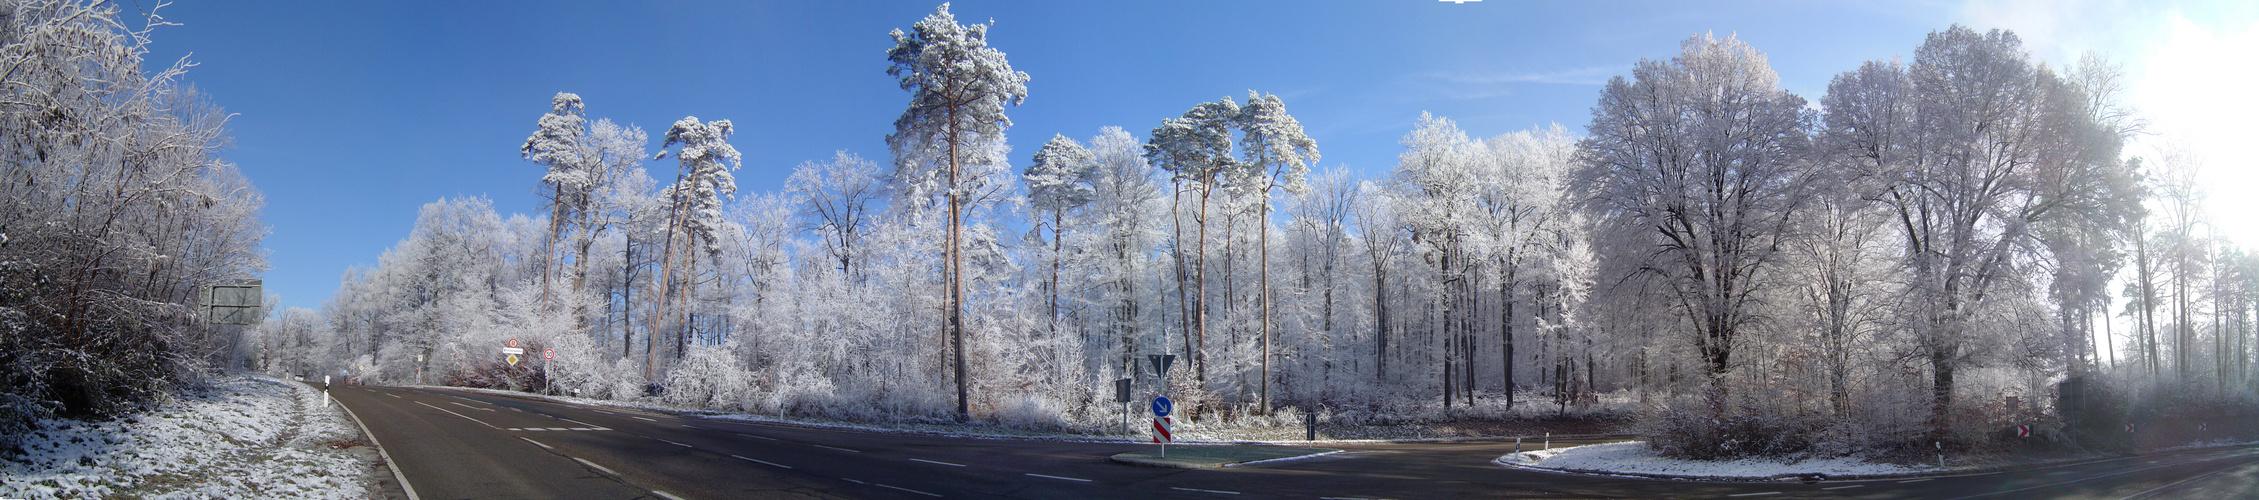 Frostlandschaft